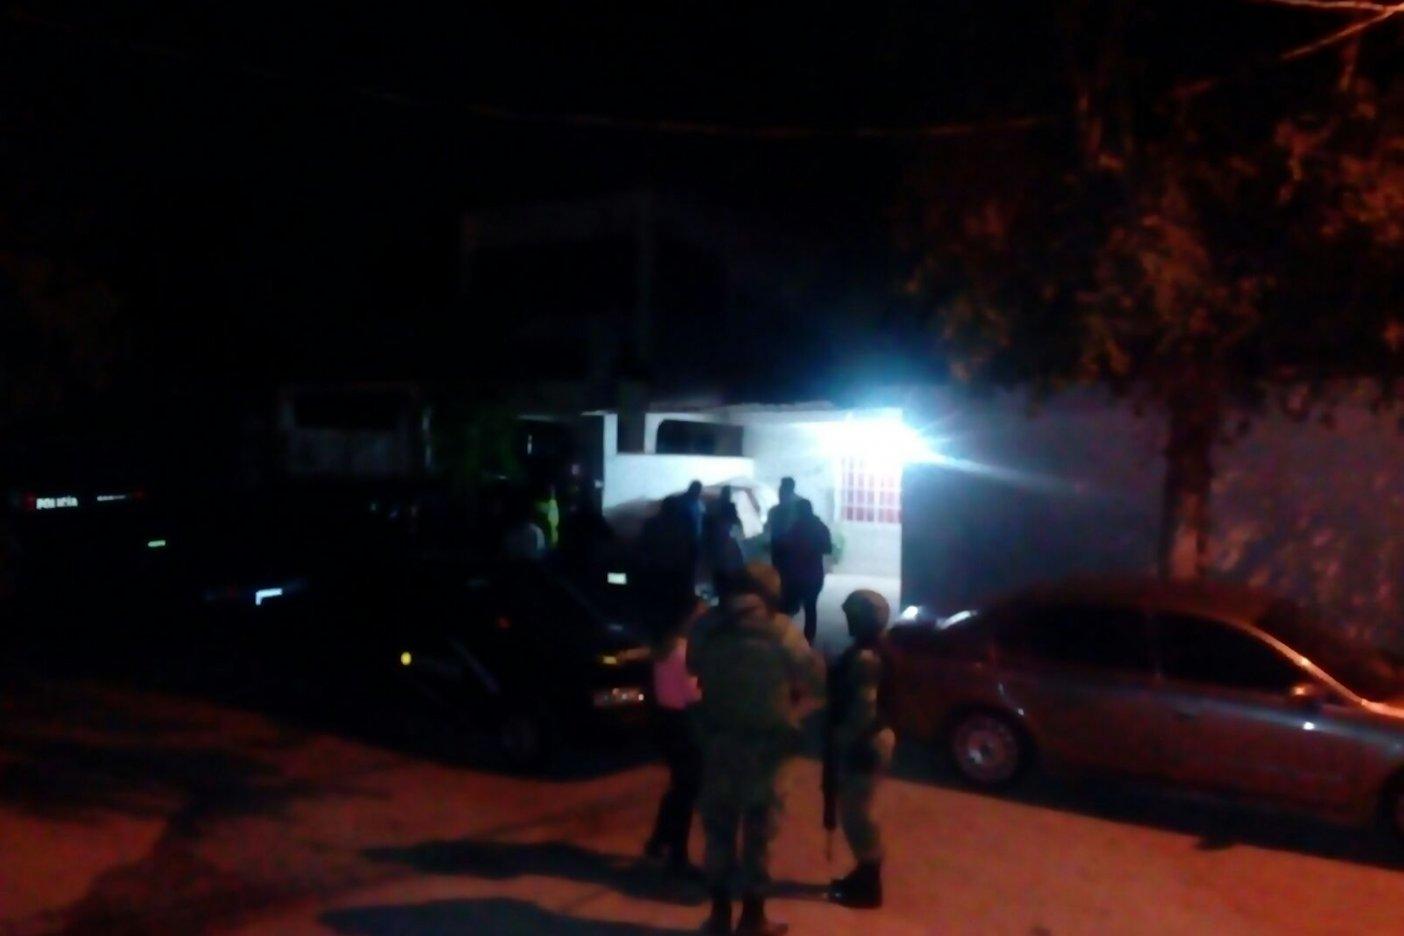 Matan a hermano de Julio César Chávez en Culiacán